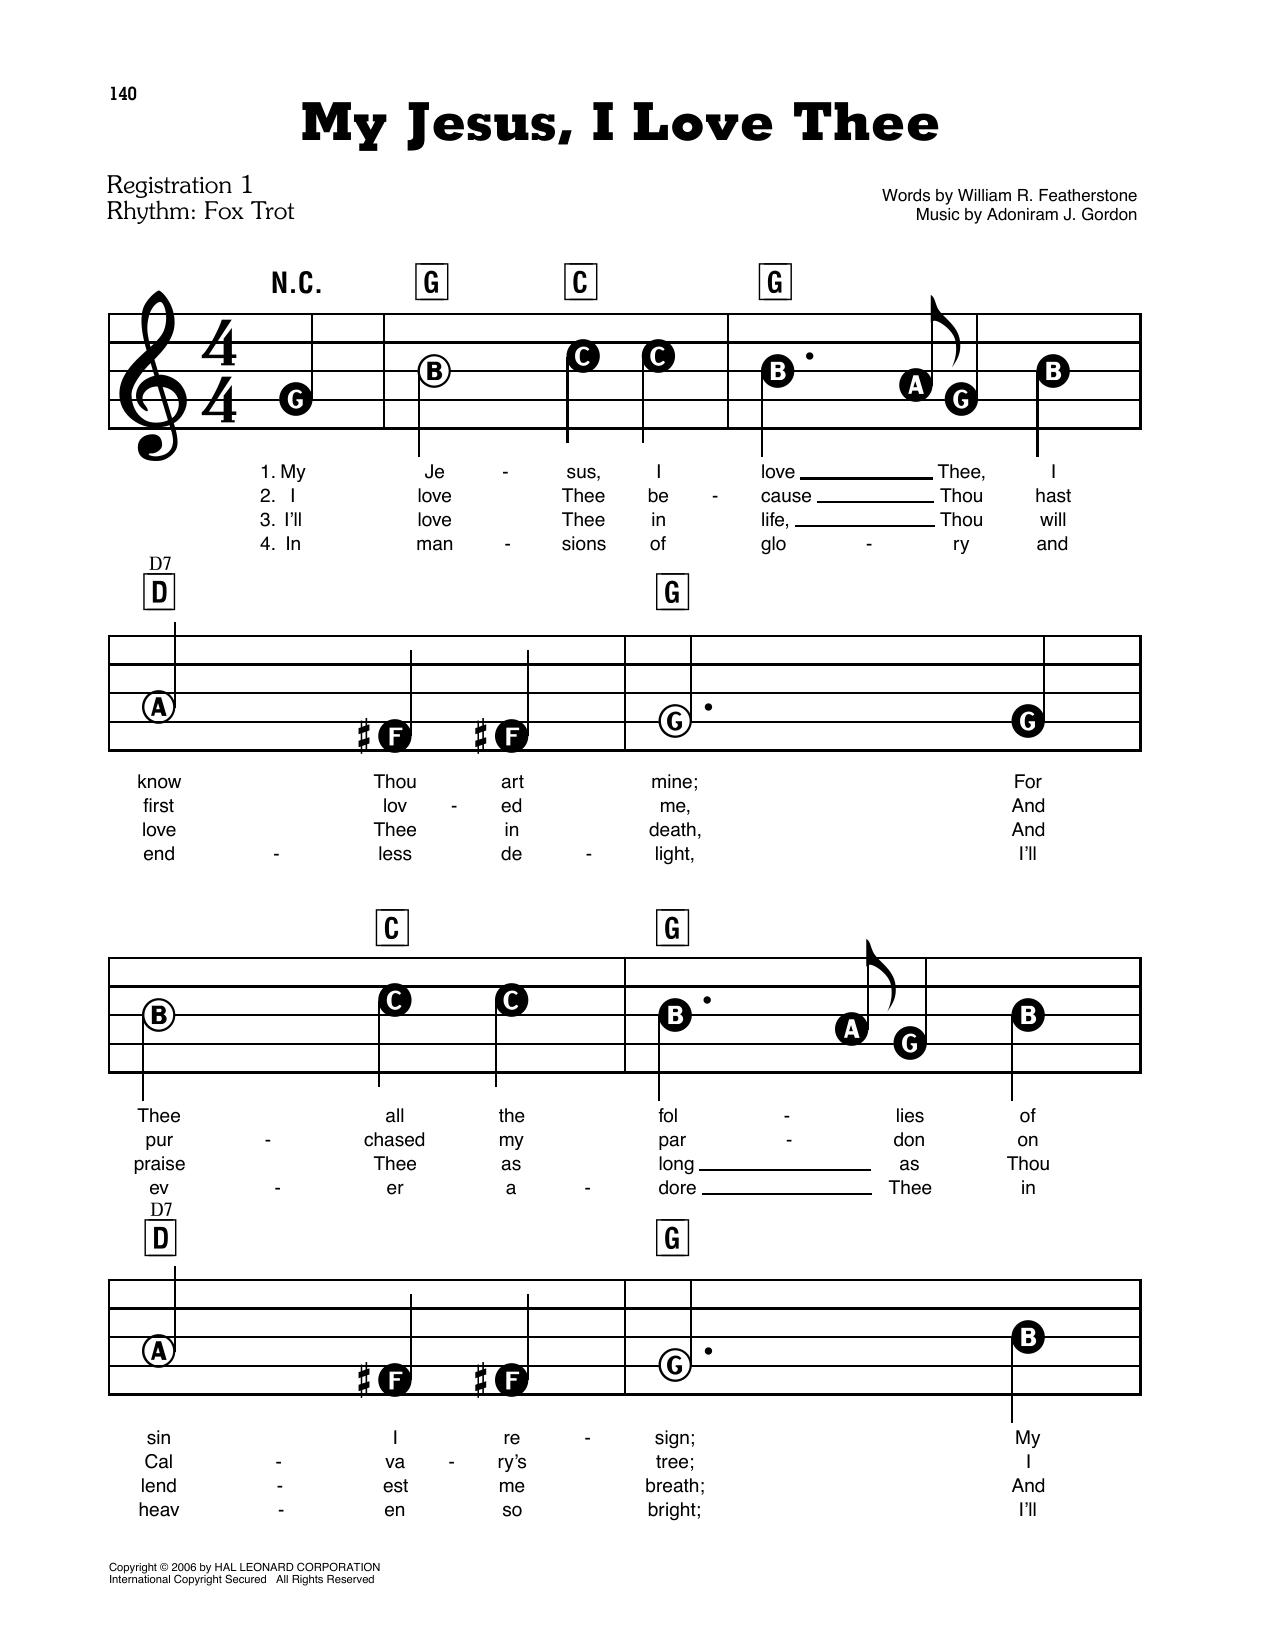 My Jesus, I Love Thee Sheet Music